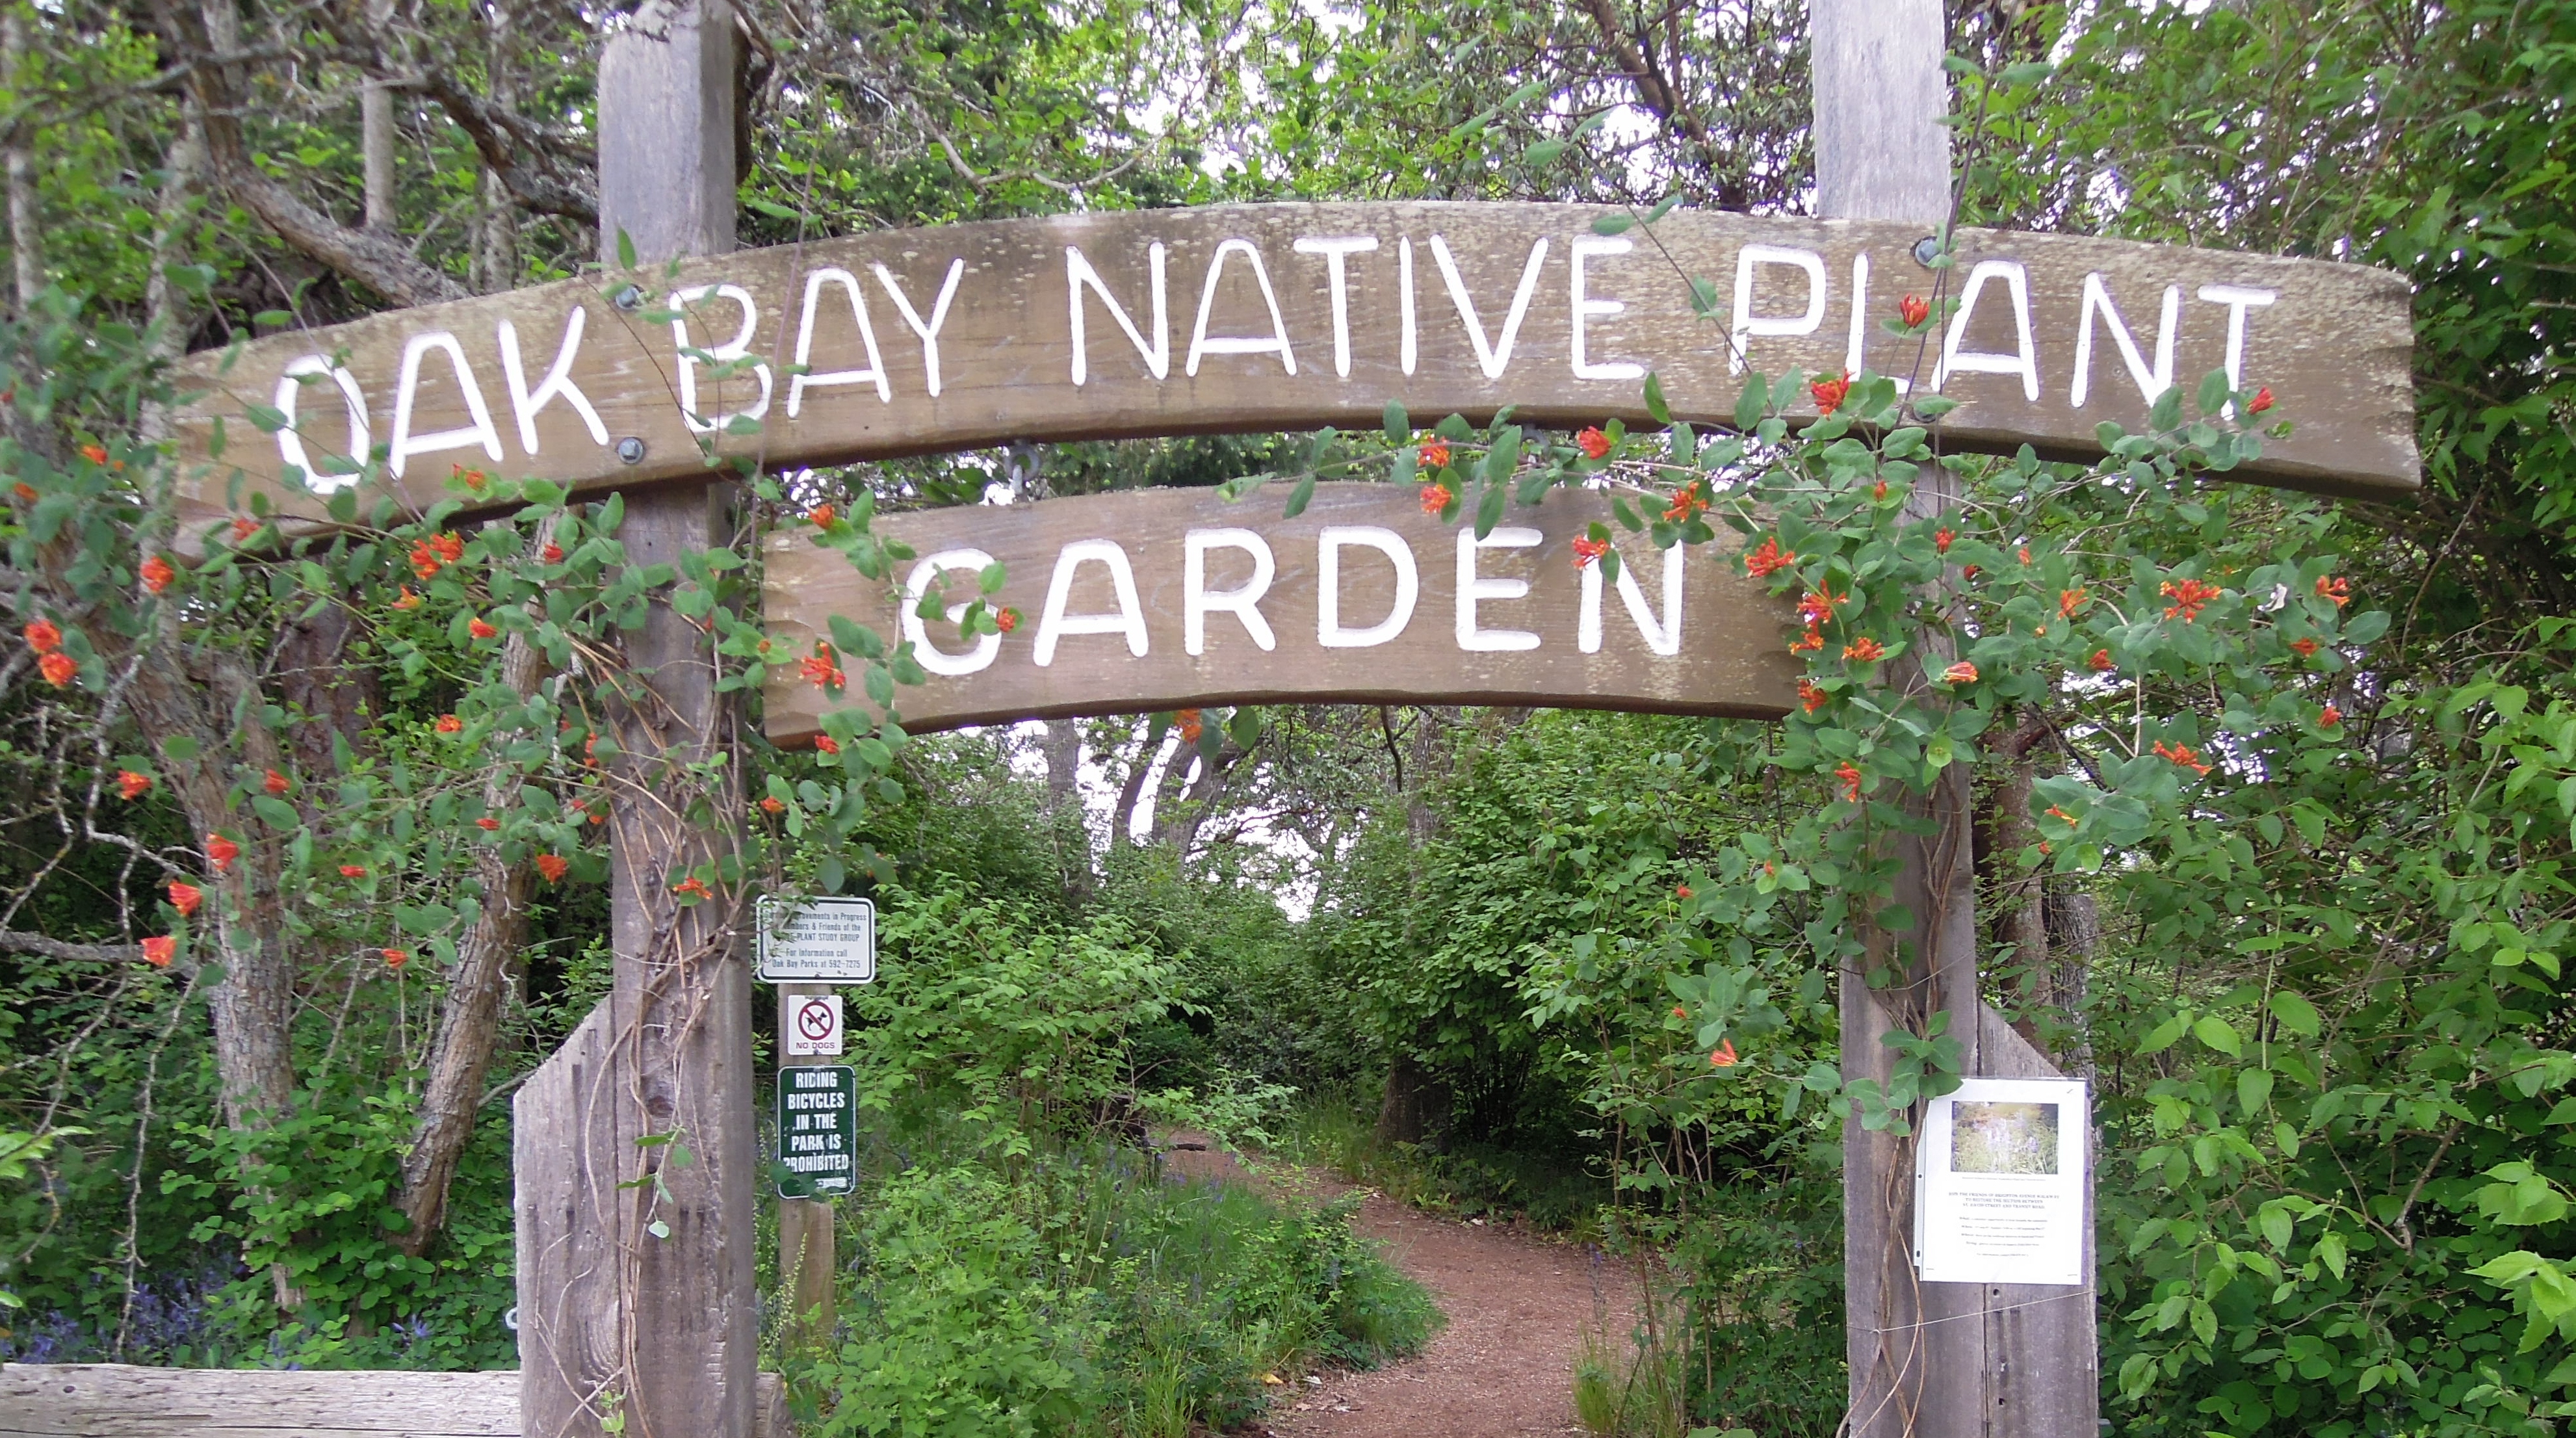 Native Plant Garden   Map. Gardens   Native Plant Garden   Greater Victoria Labyrinth s